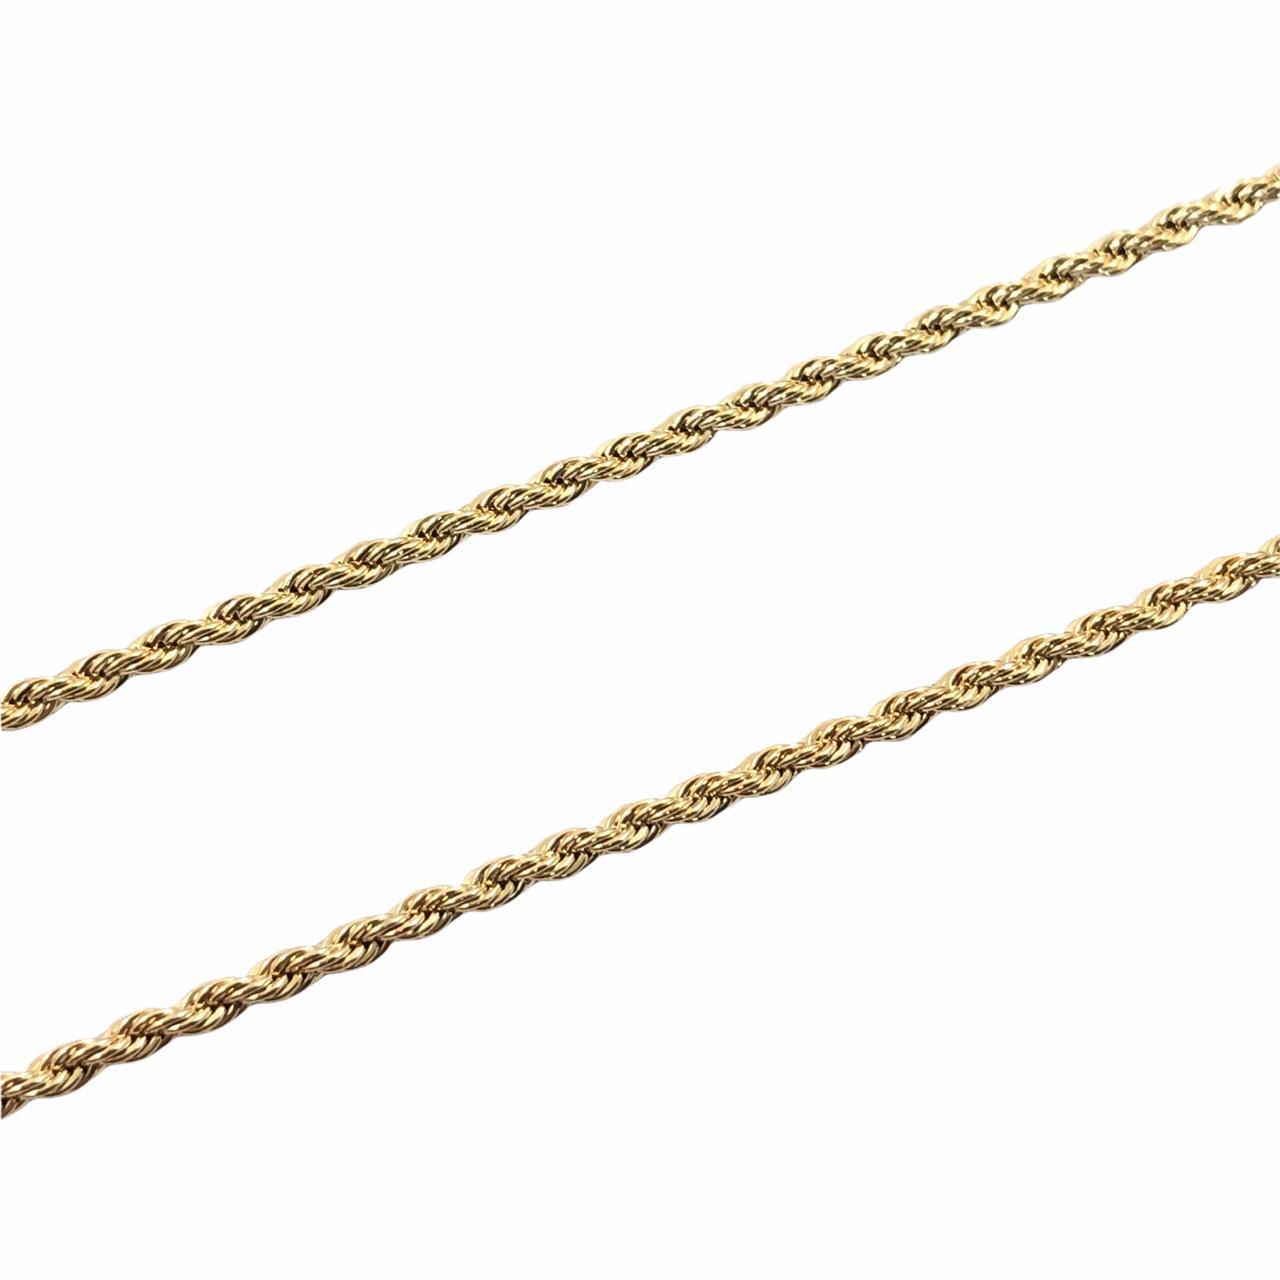 CR415 - Corrente Cordão Baiano 2mm Banhado Cor Dourado - 1metro